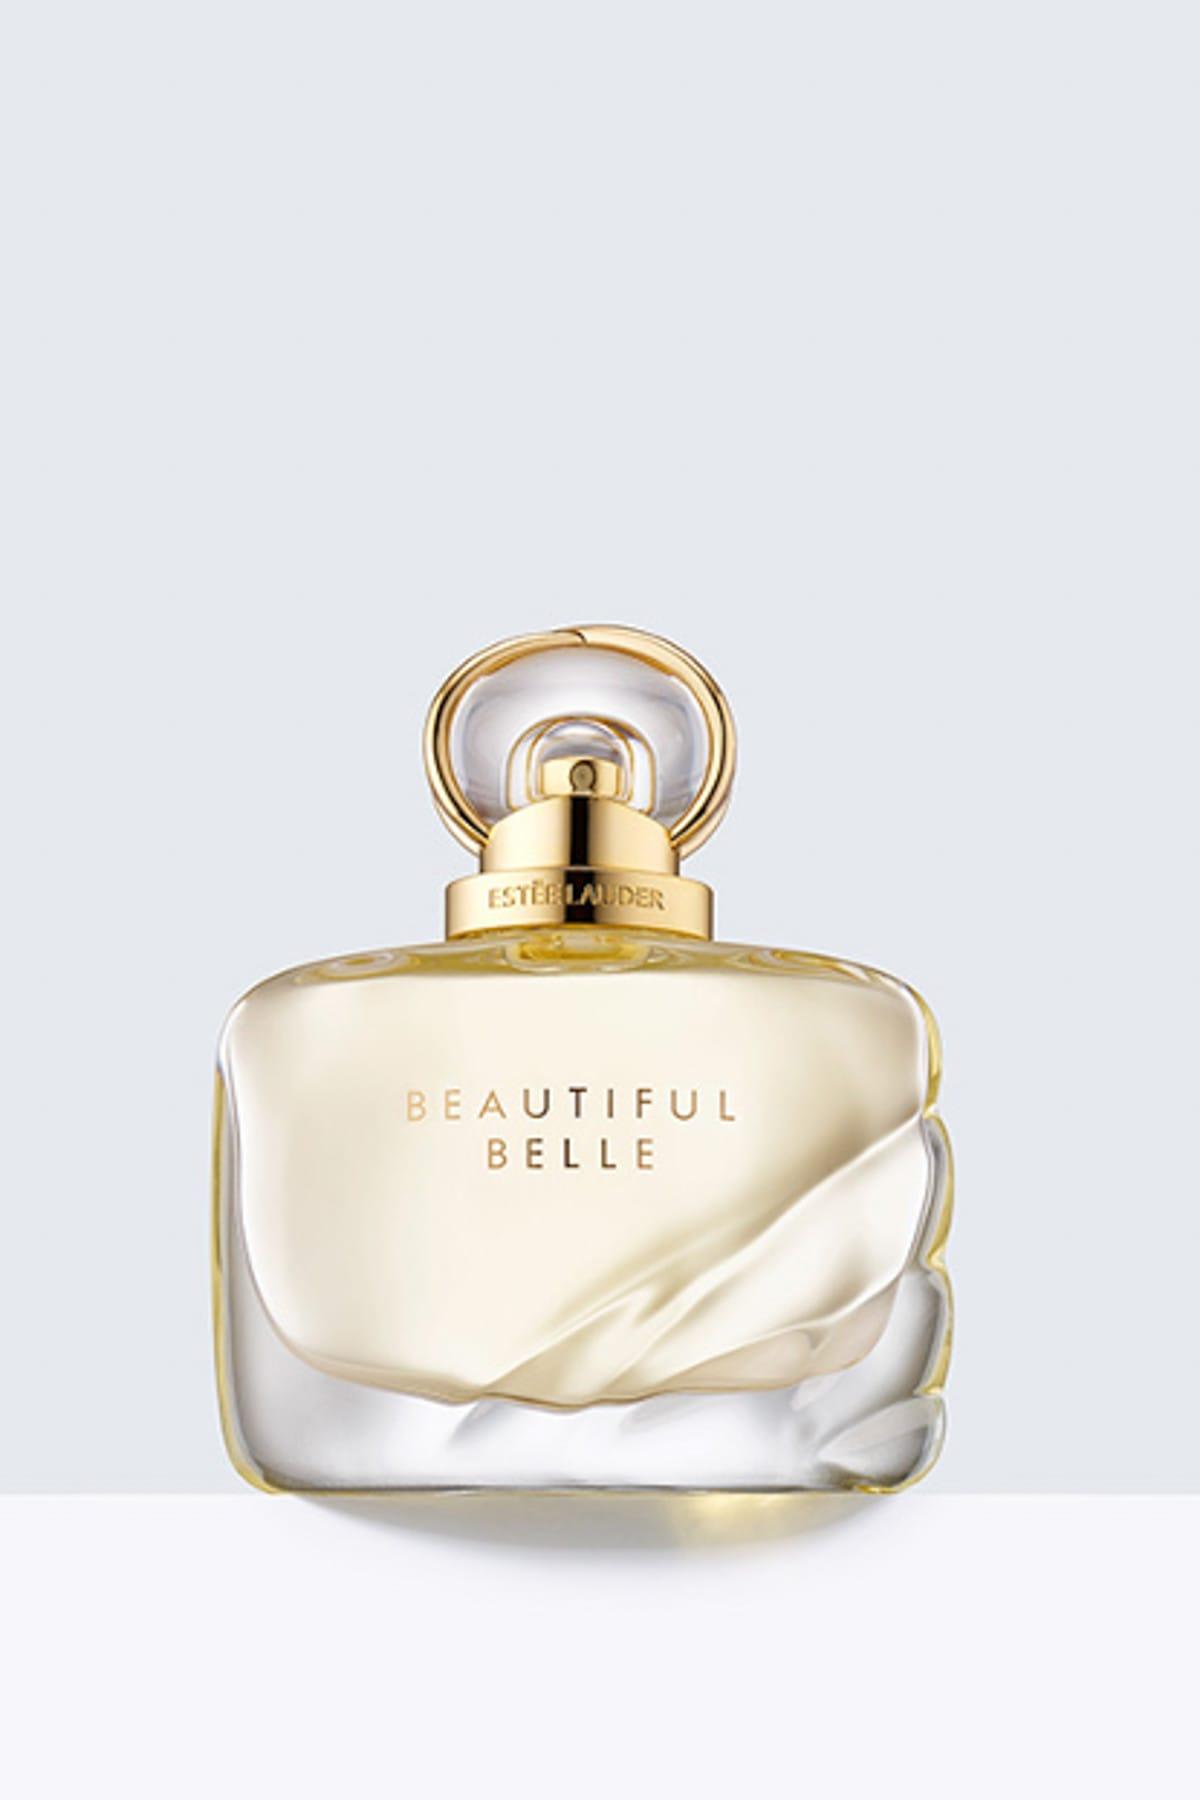 عطر زنانه ۳۰ میل اصل Beautiful belle مارک استی لادور  Estee Lauder